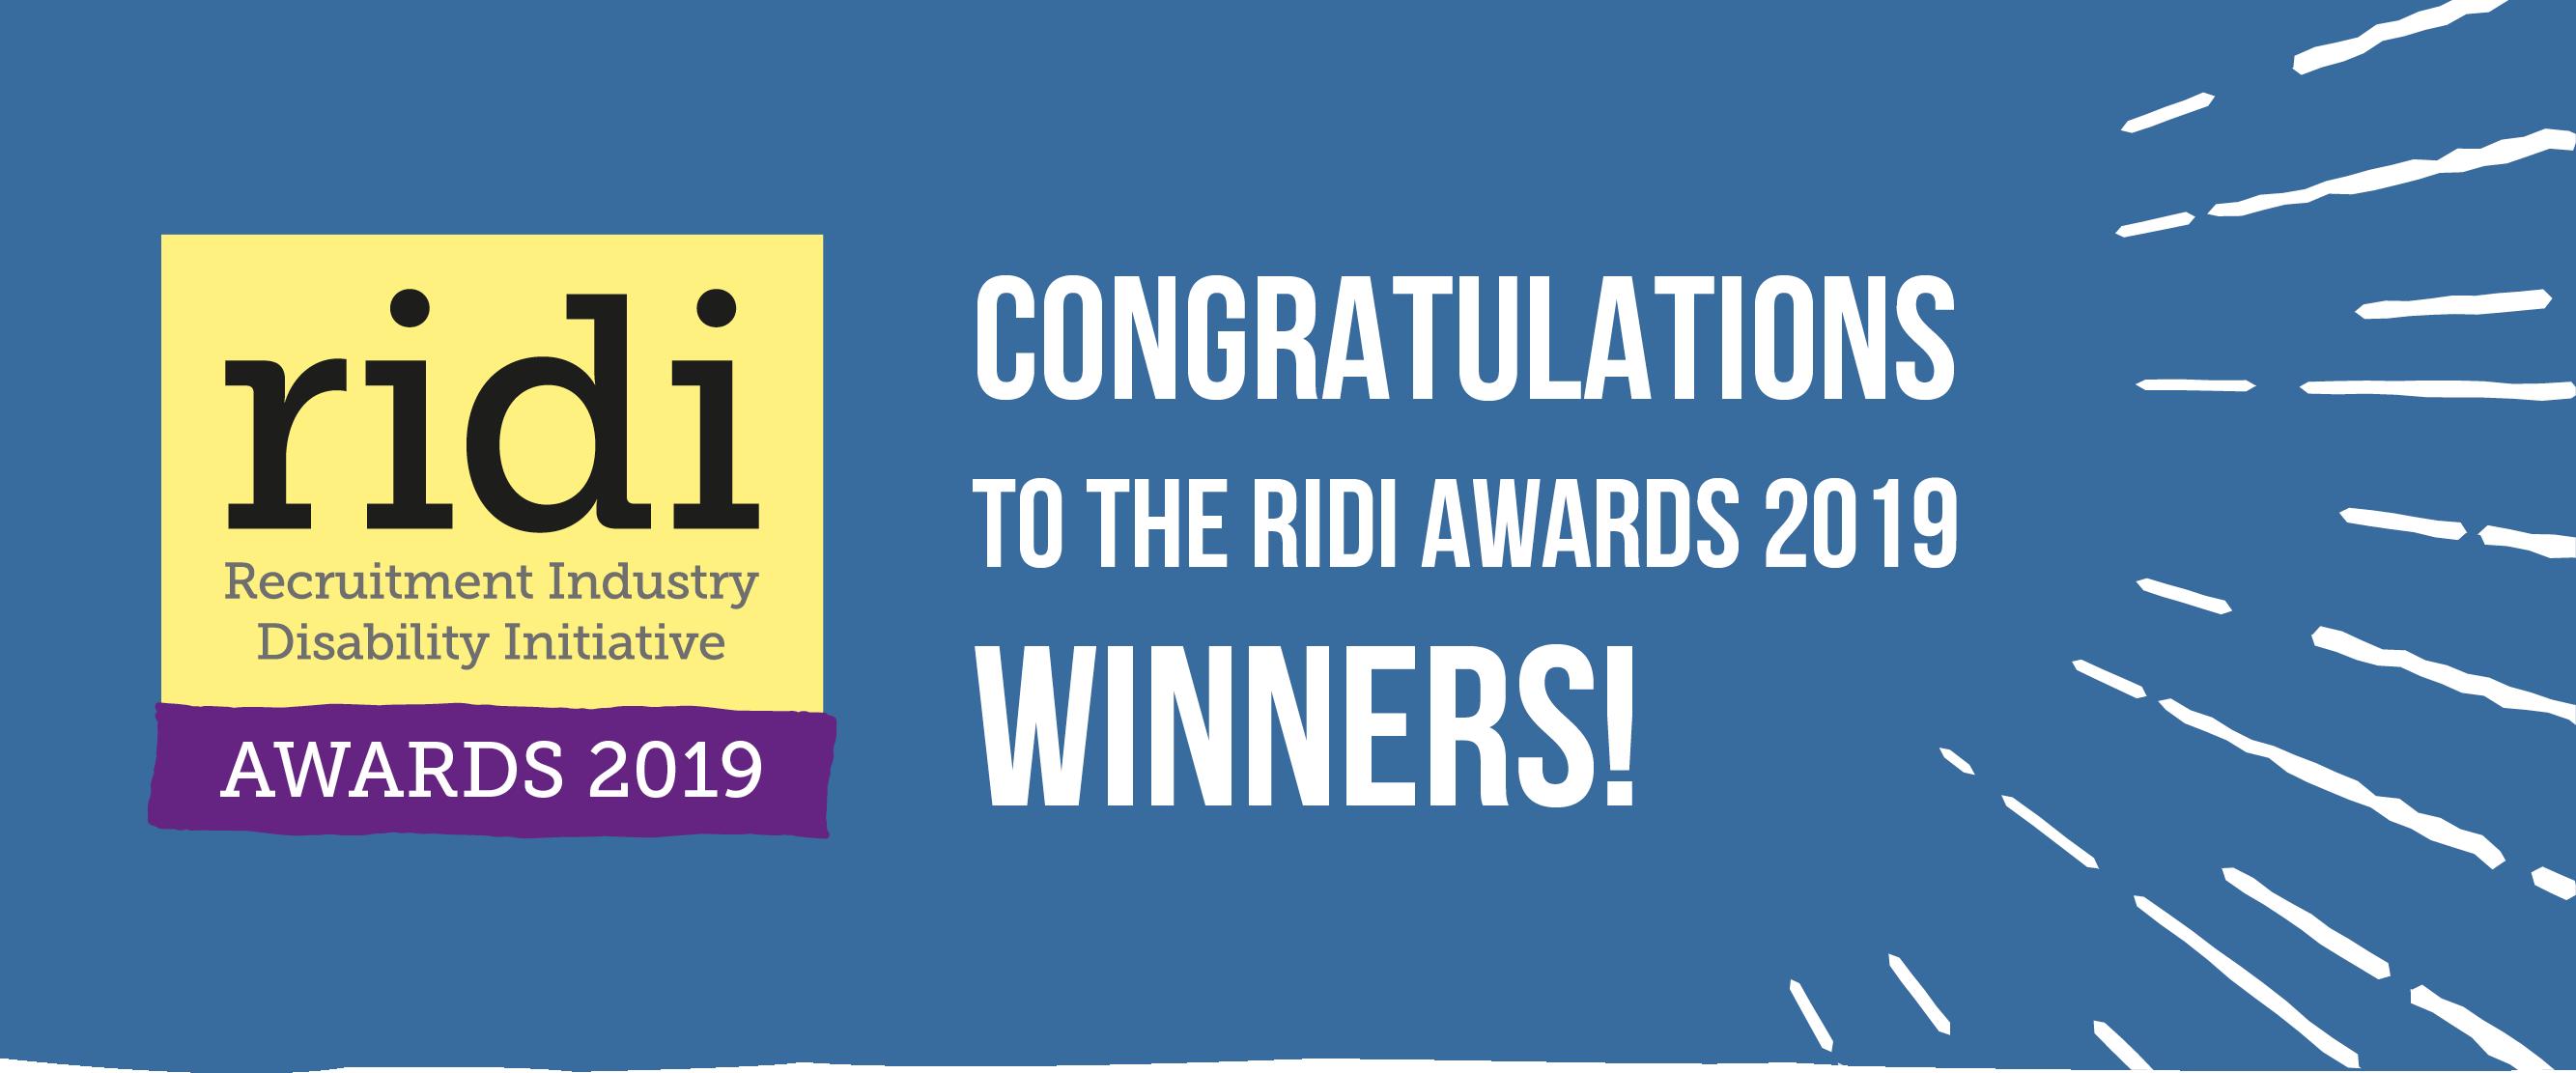 RIDI Awards 2019 logo with Congratulations to the RIDI Awards 2019 winners strapline